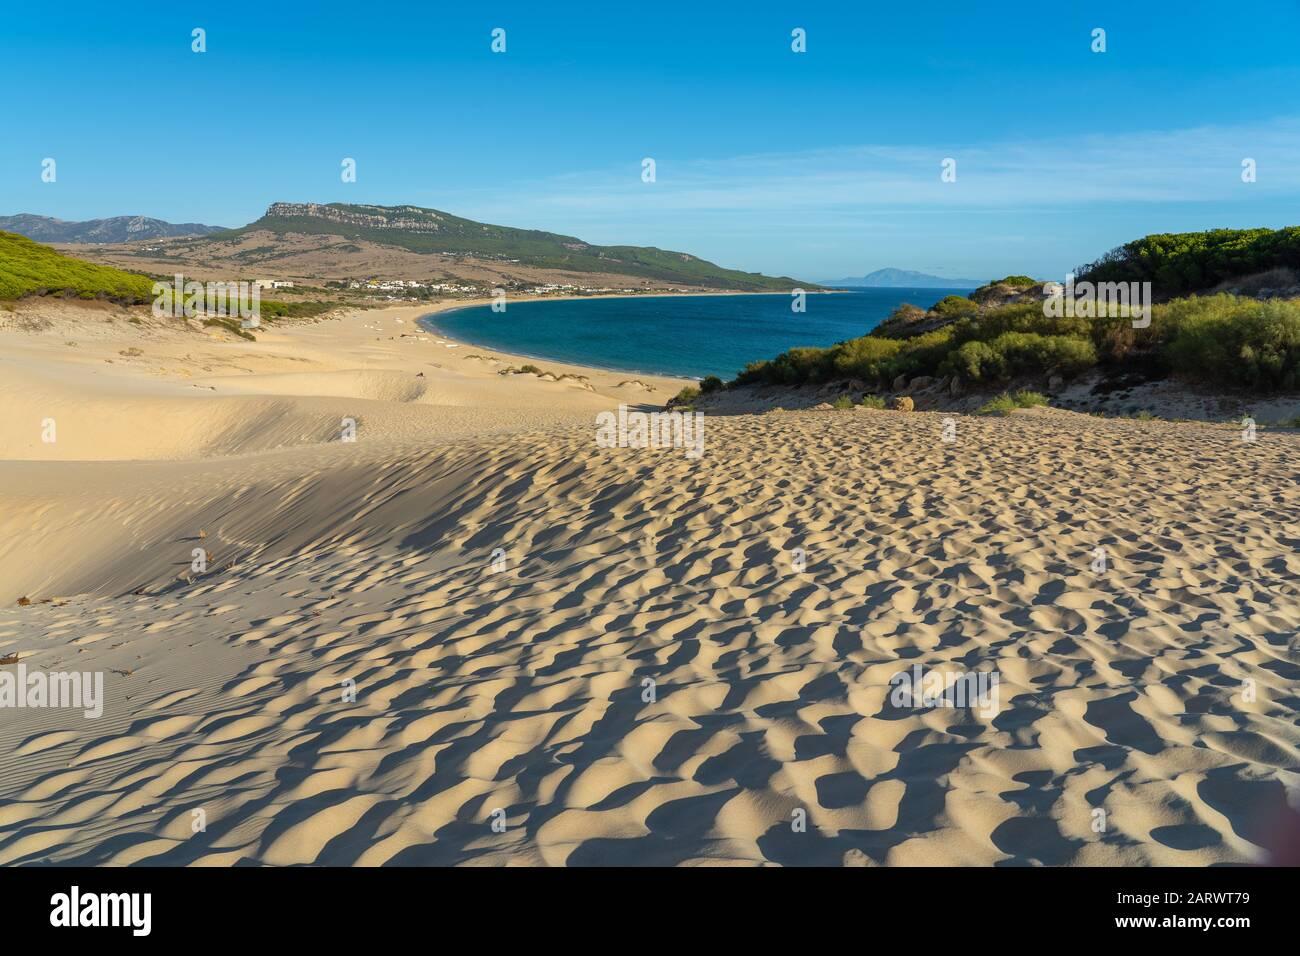 Beautiful shot of estrecho natural park of bolonia beach in spain Stock Photo